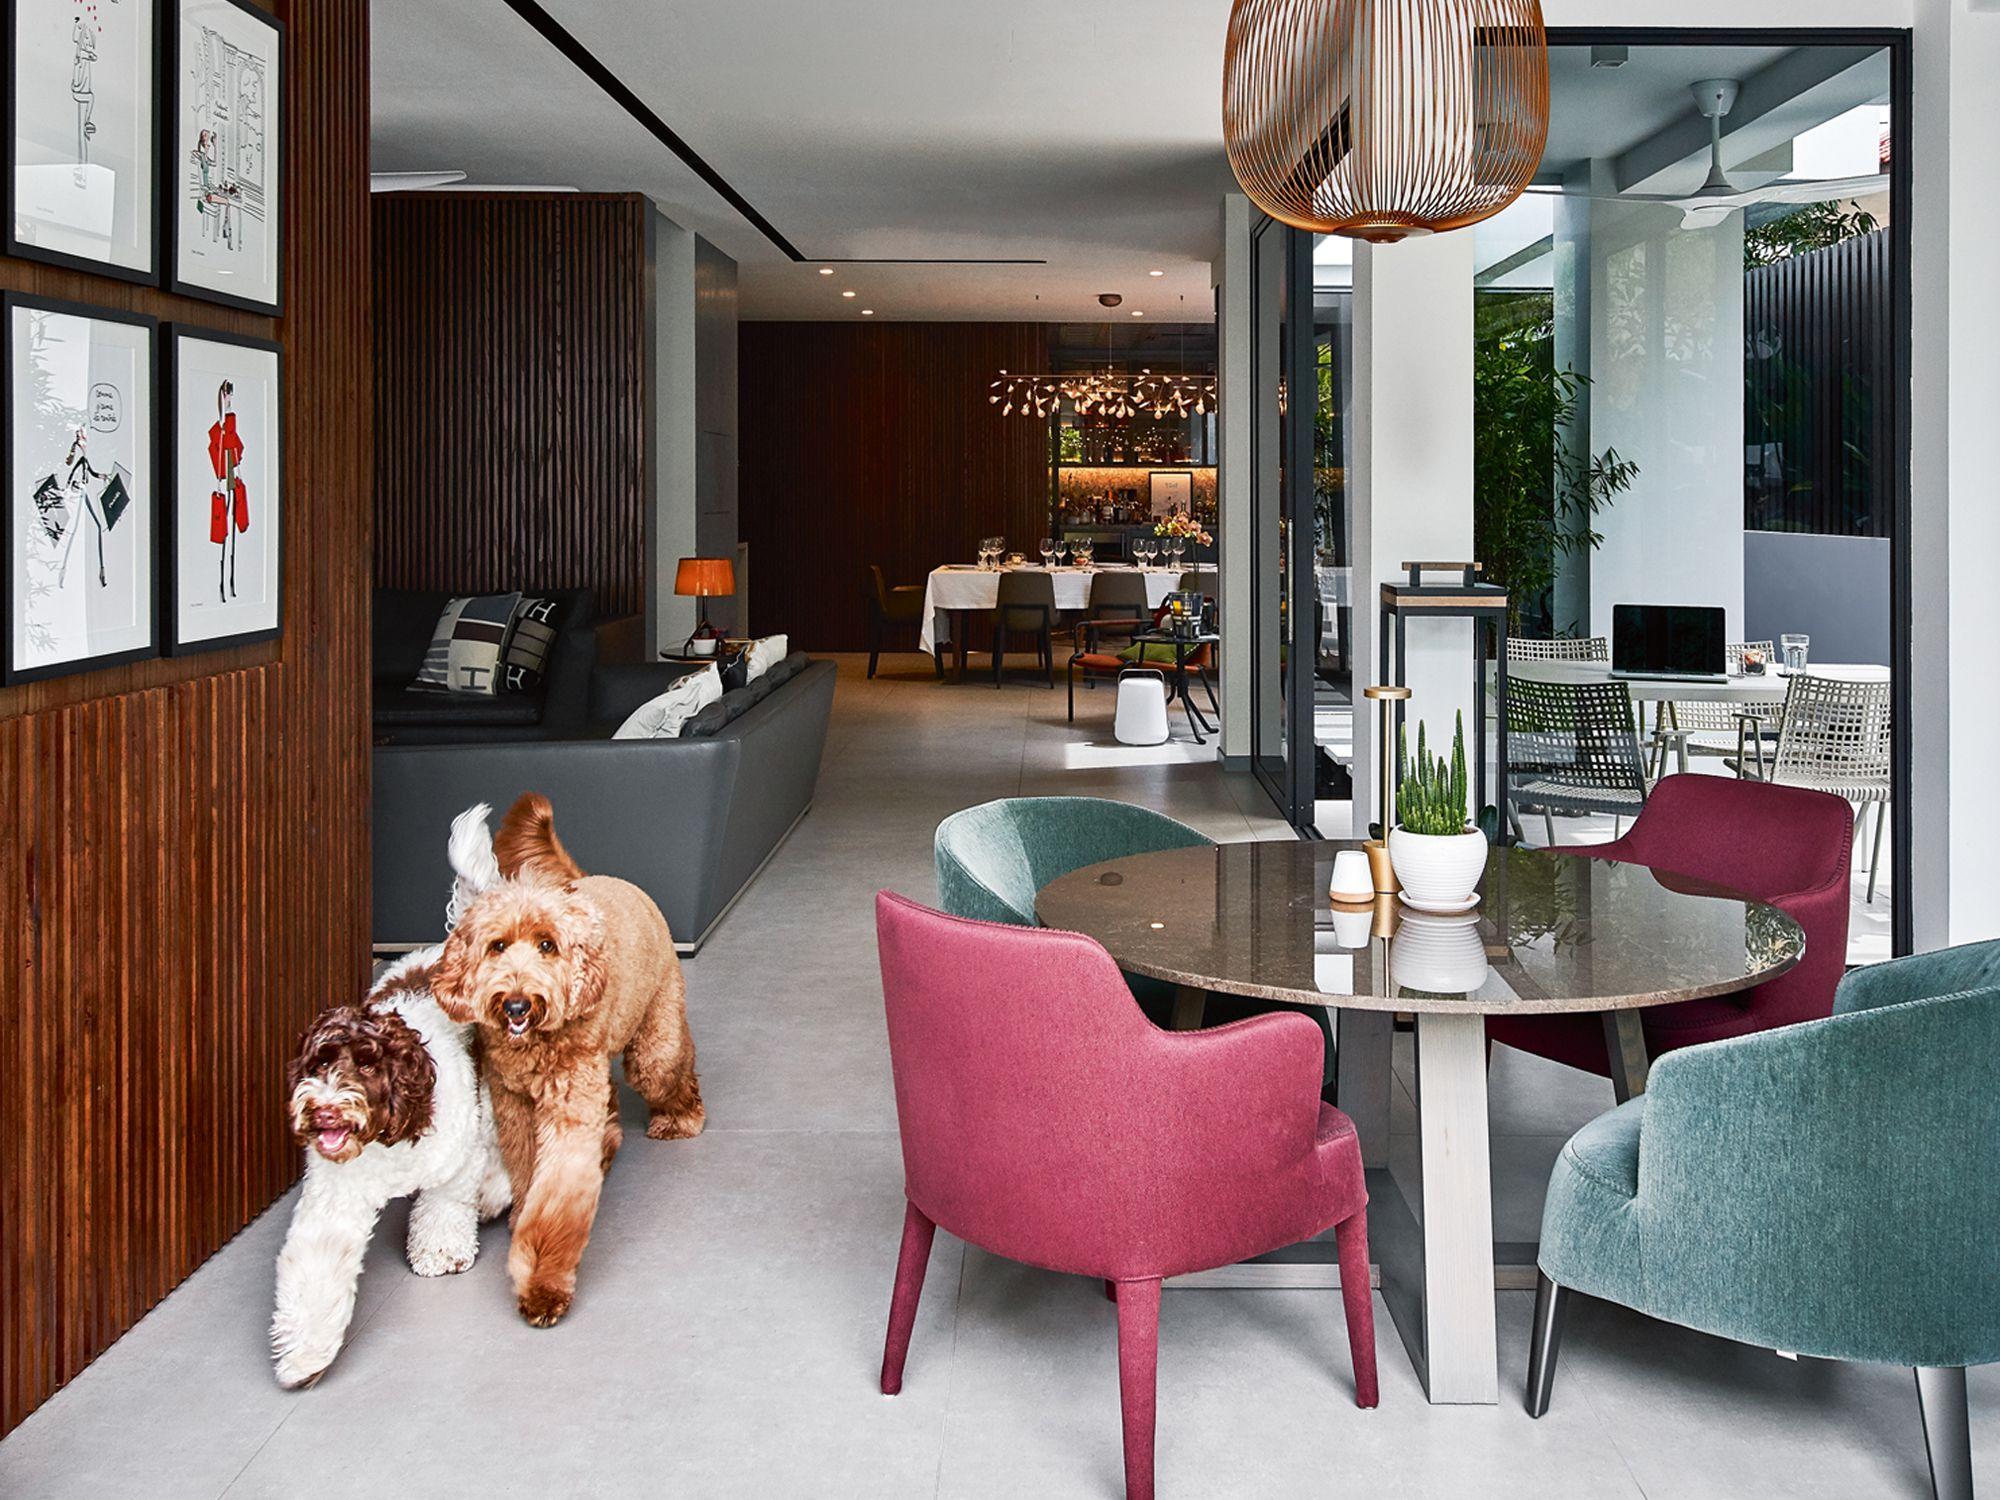 Home Tour: A Family's Dog-Friendly Semi Detached House